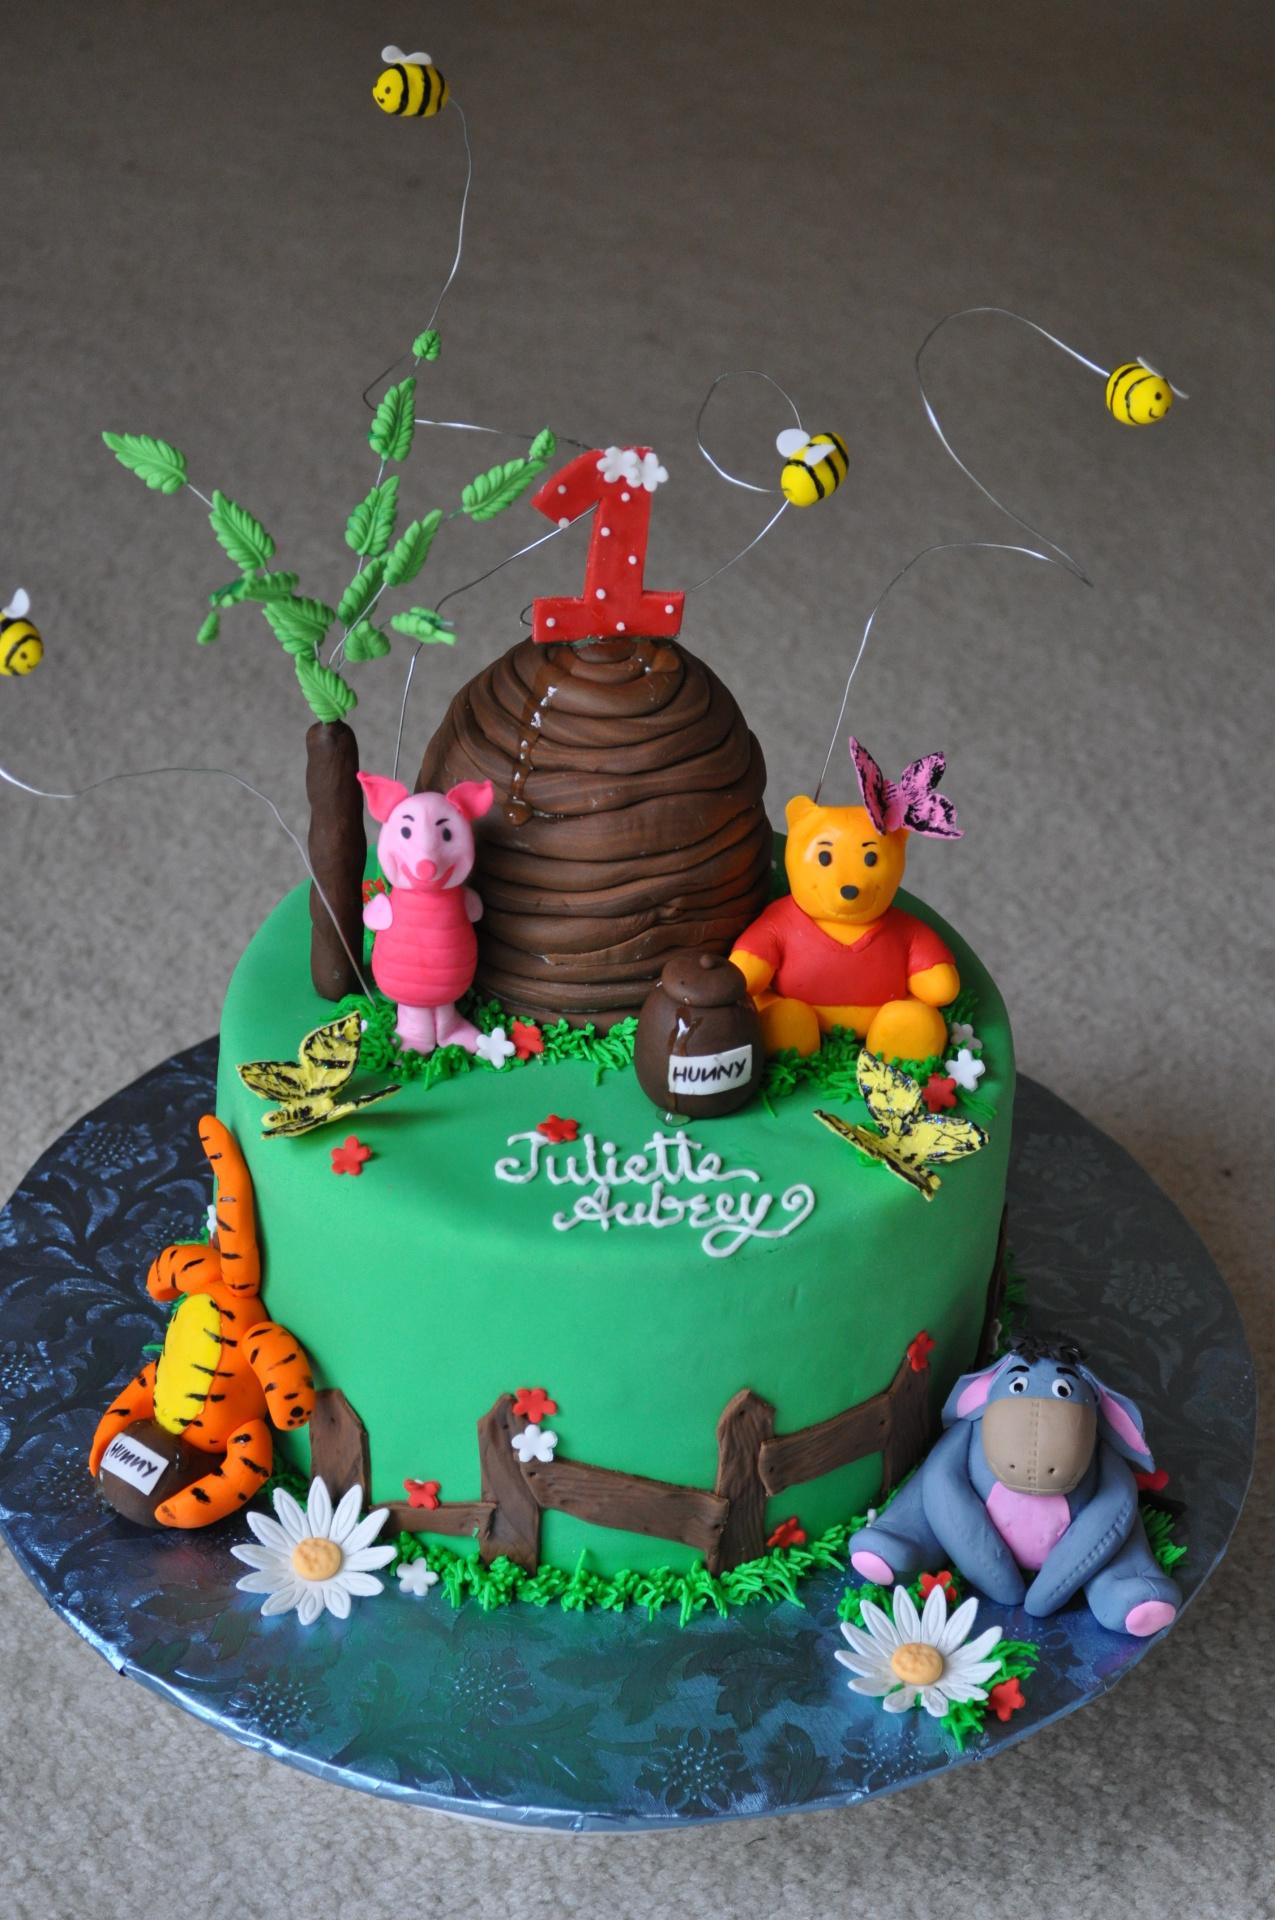 Winnie the Poooh cake, 100 acre woods cake, beehive cake